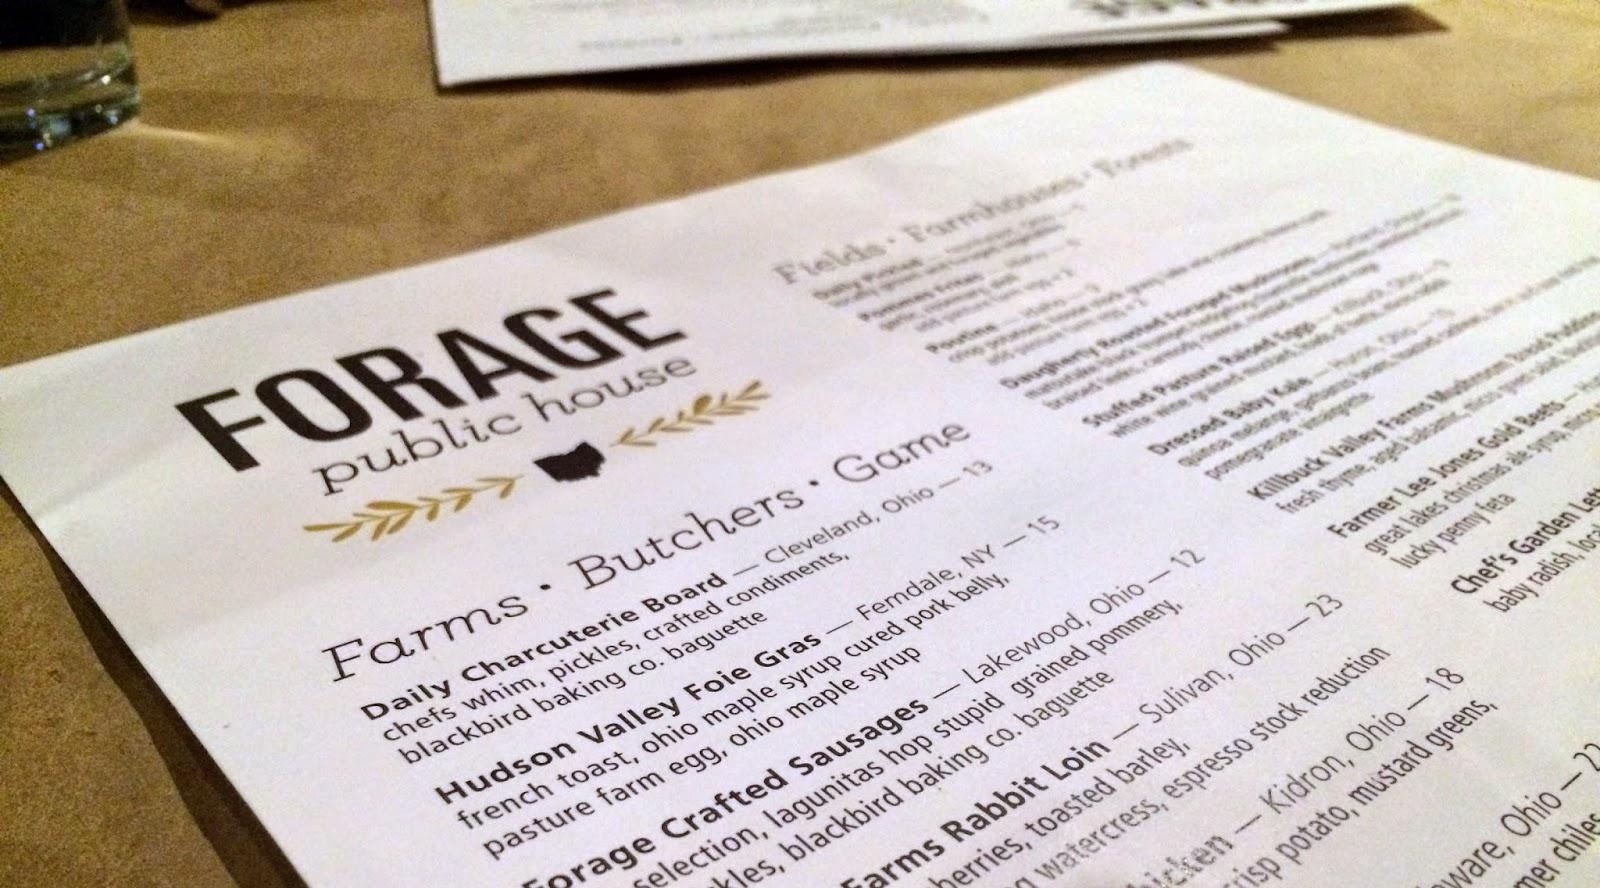 Bite Buff: Forage Public House